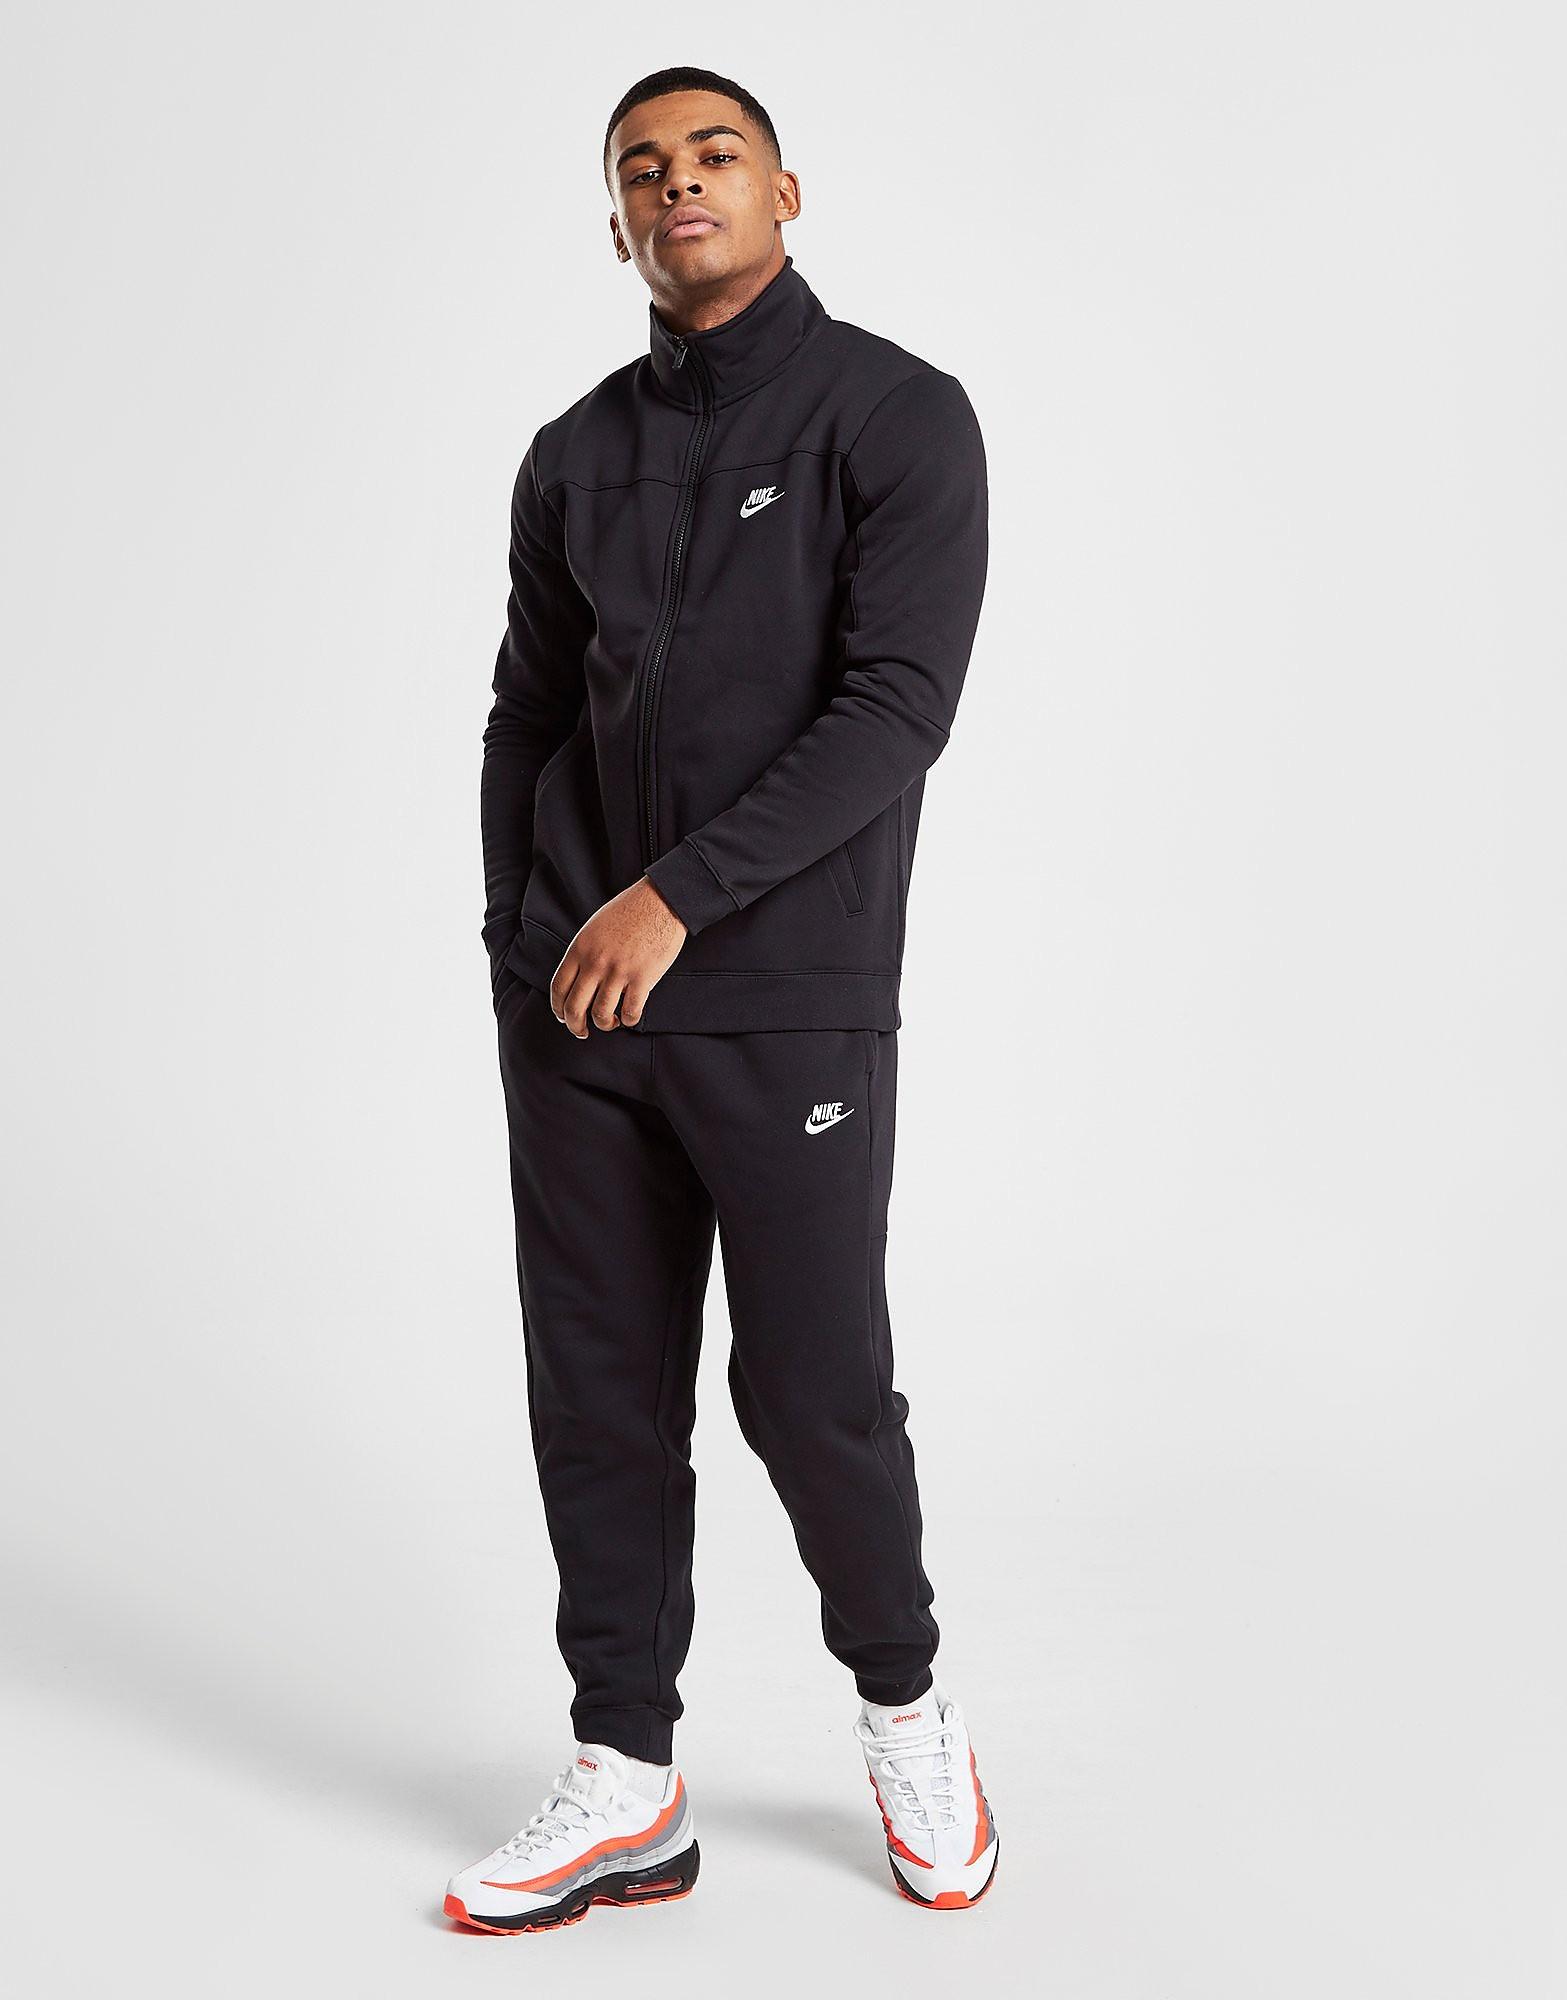 Nike Season 2 Tracksuit